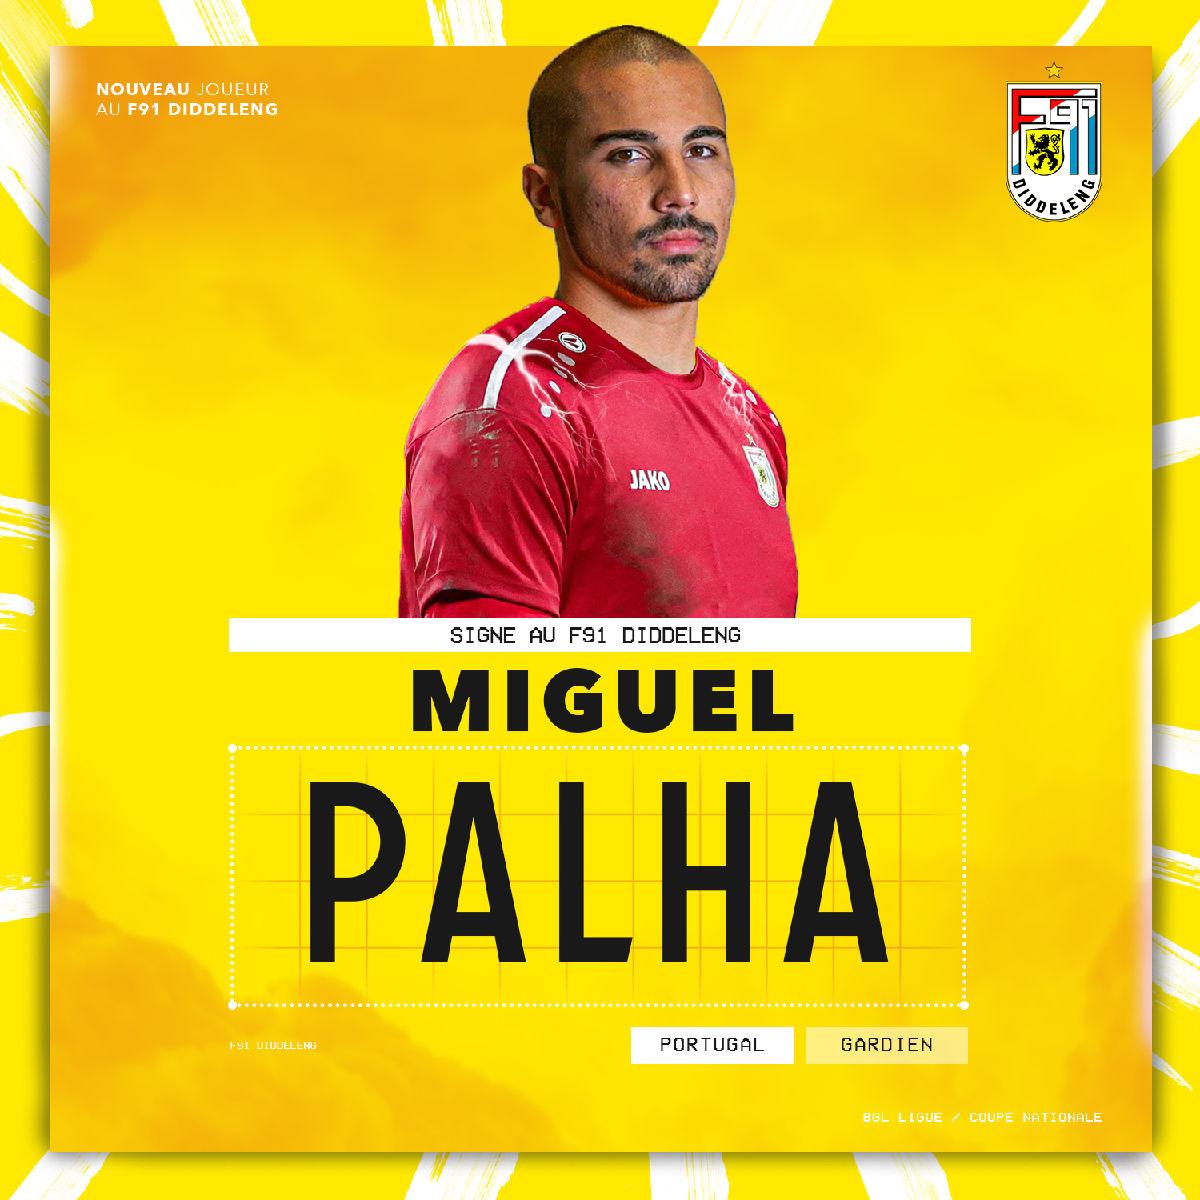 Miguel Palha signe au F91 !